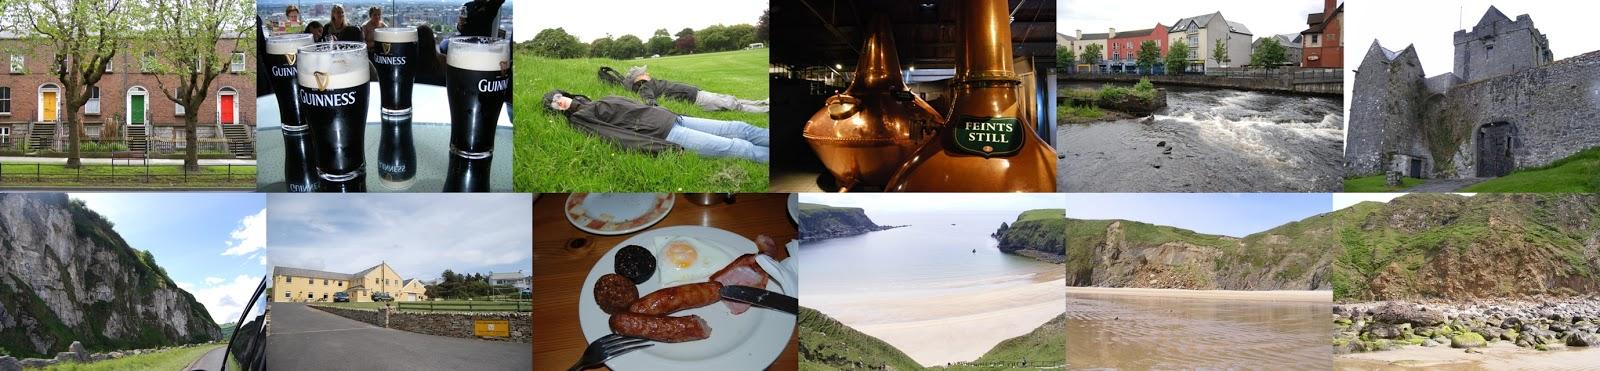 Retrospectiva 2012: Irlanda